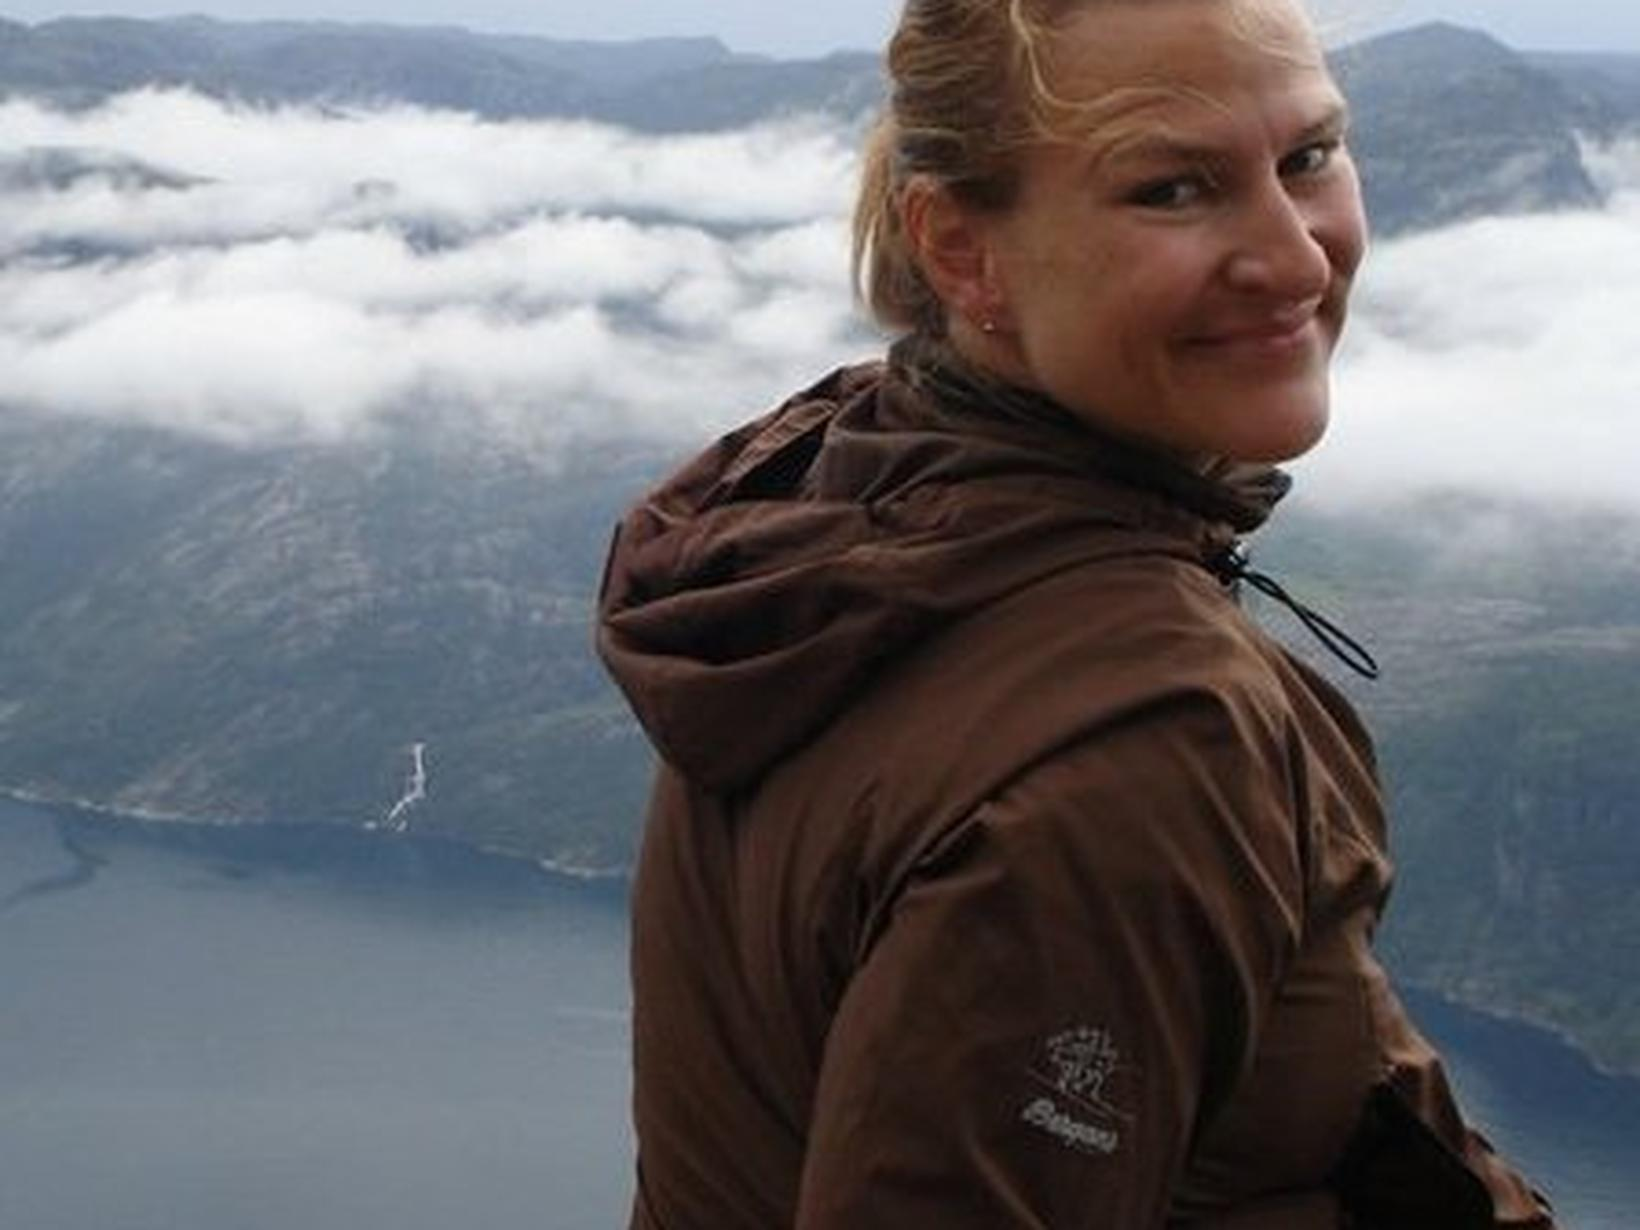 Brigitte from Oslo, Norway